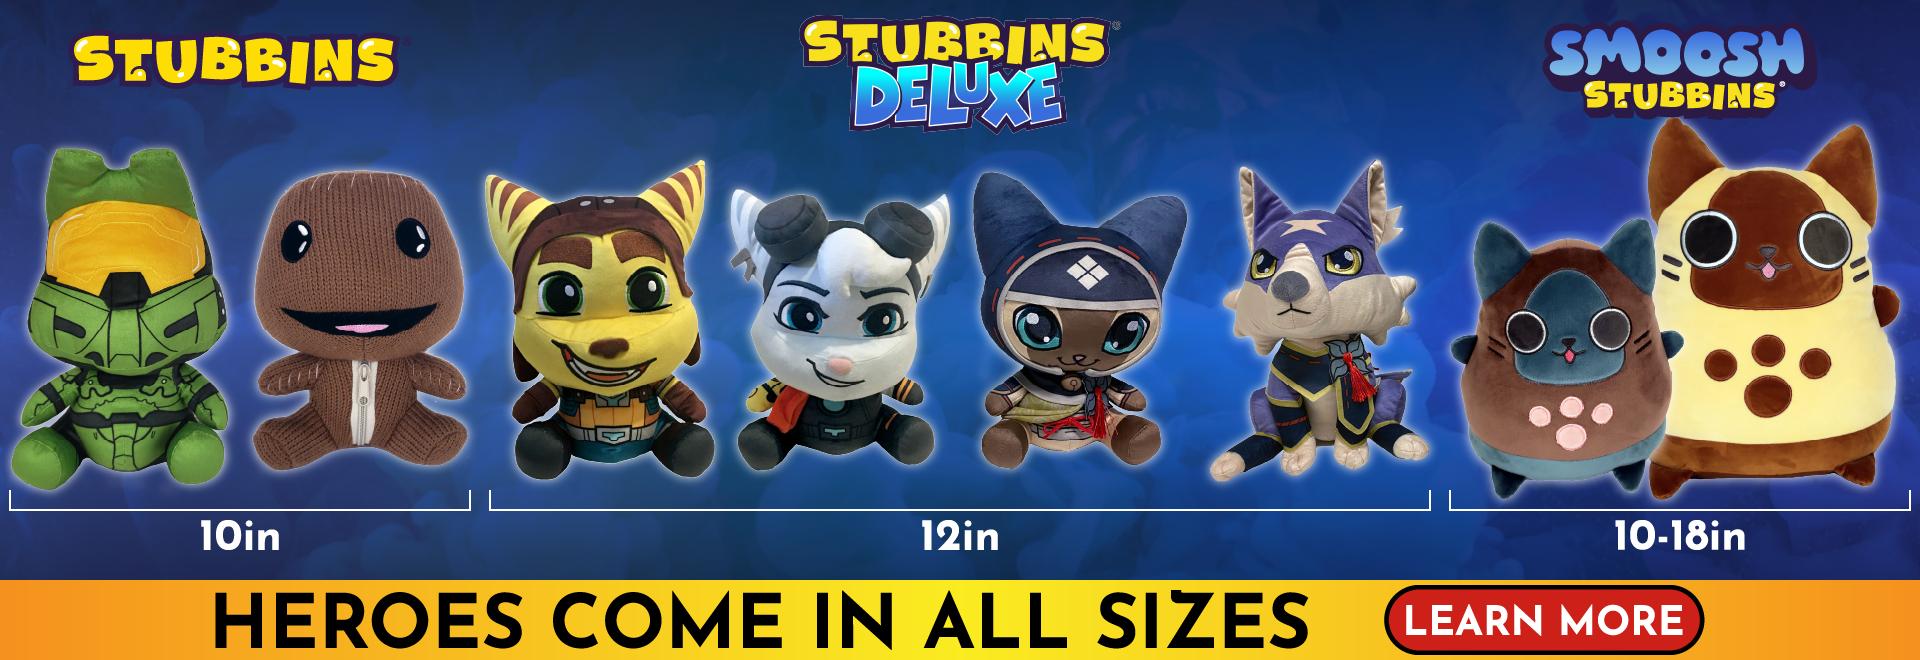 Stubbins - Deluxe and Smoosh Pre-Order